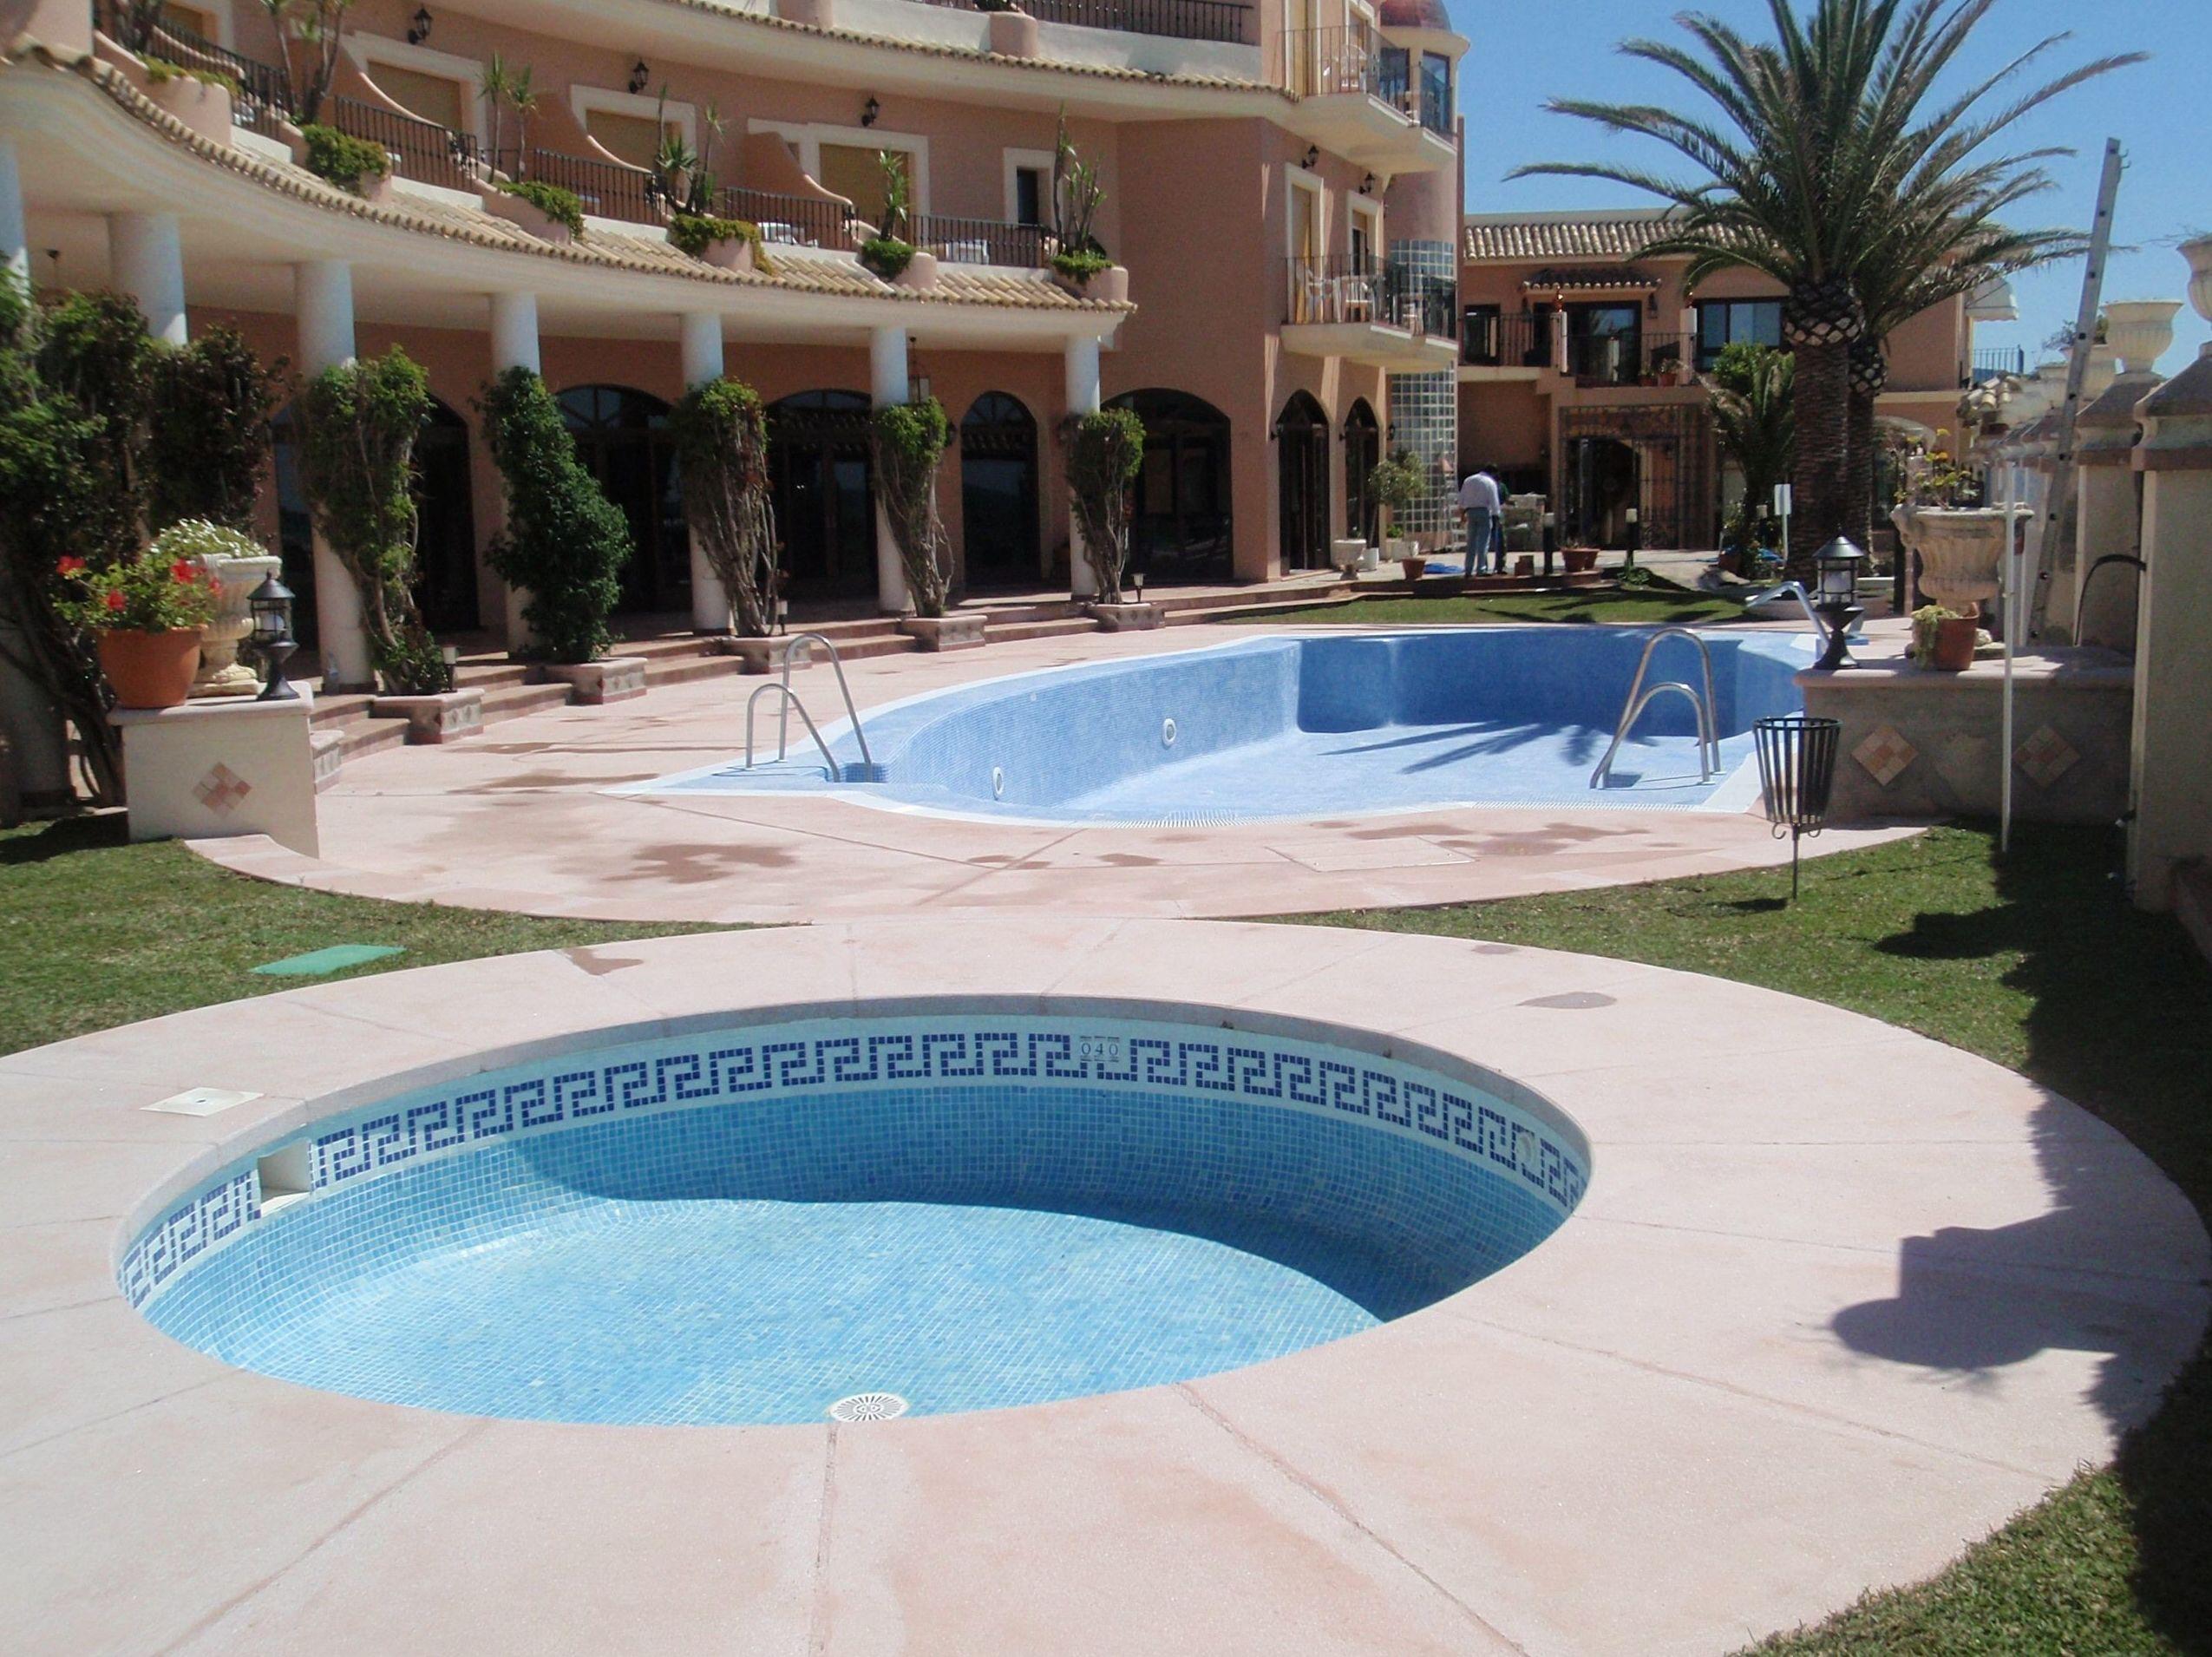 Hotel Gran Sol Atlanterra